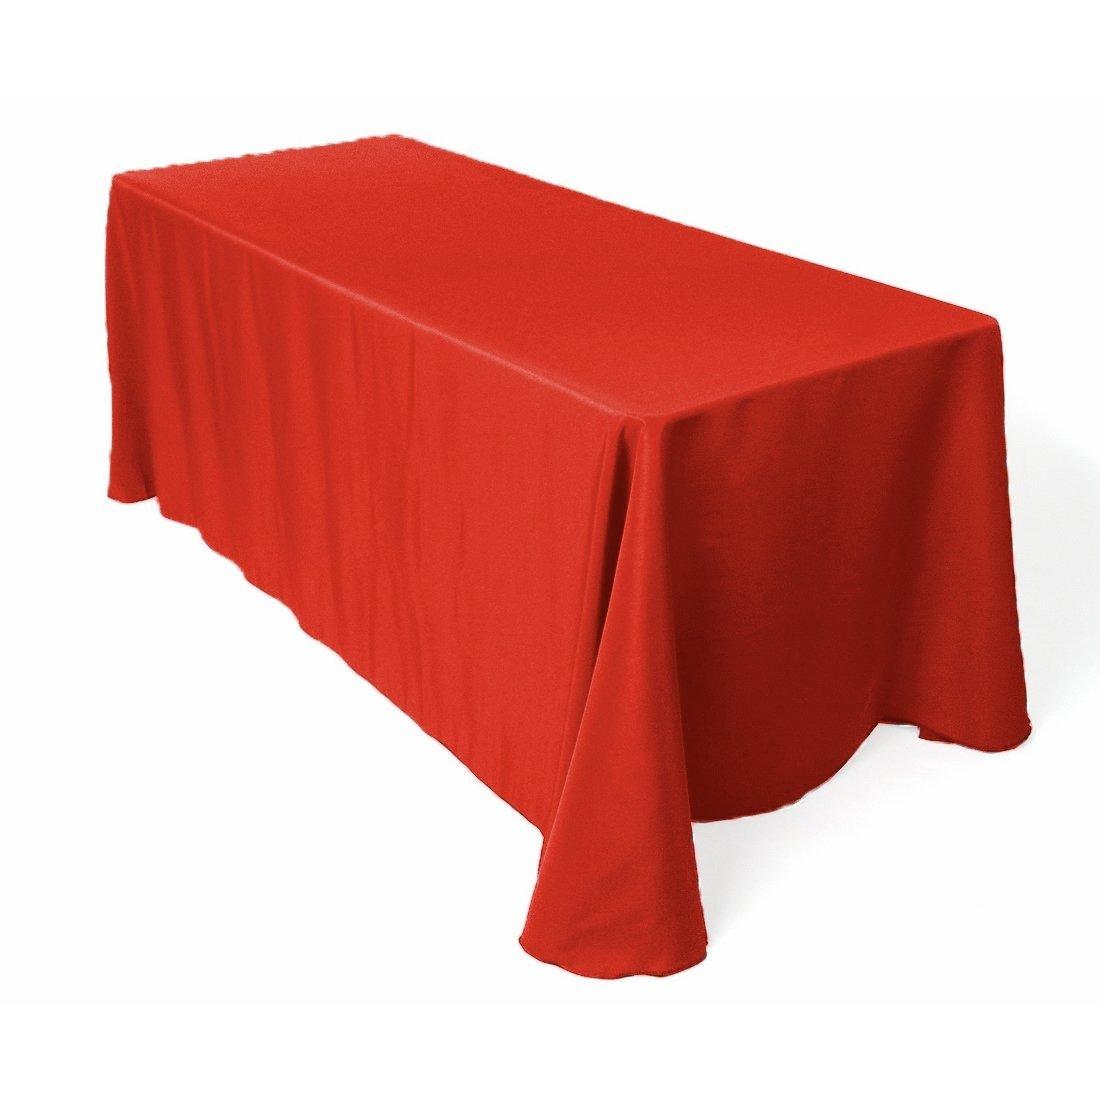 Toalha vermelha  banquete